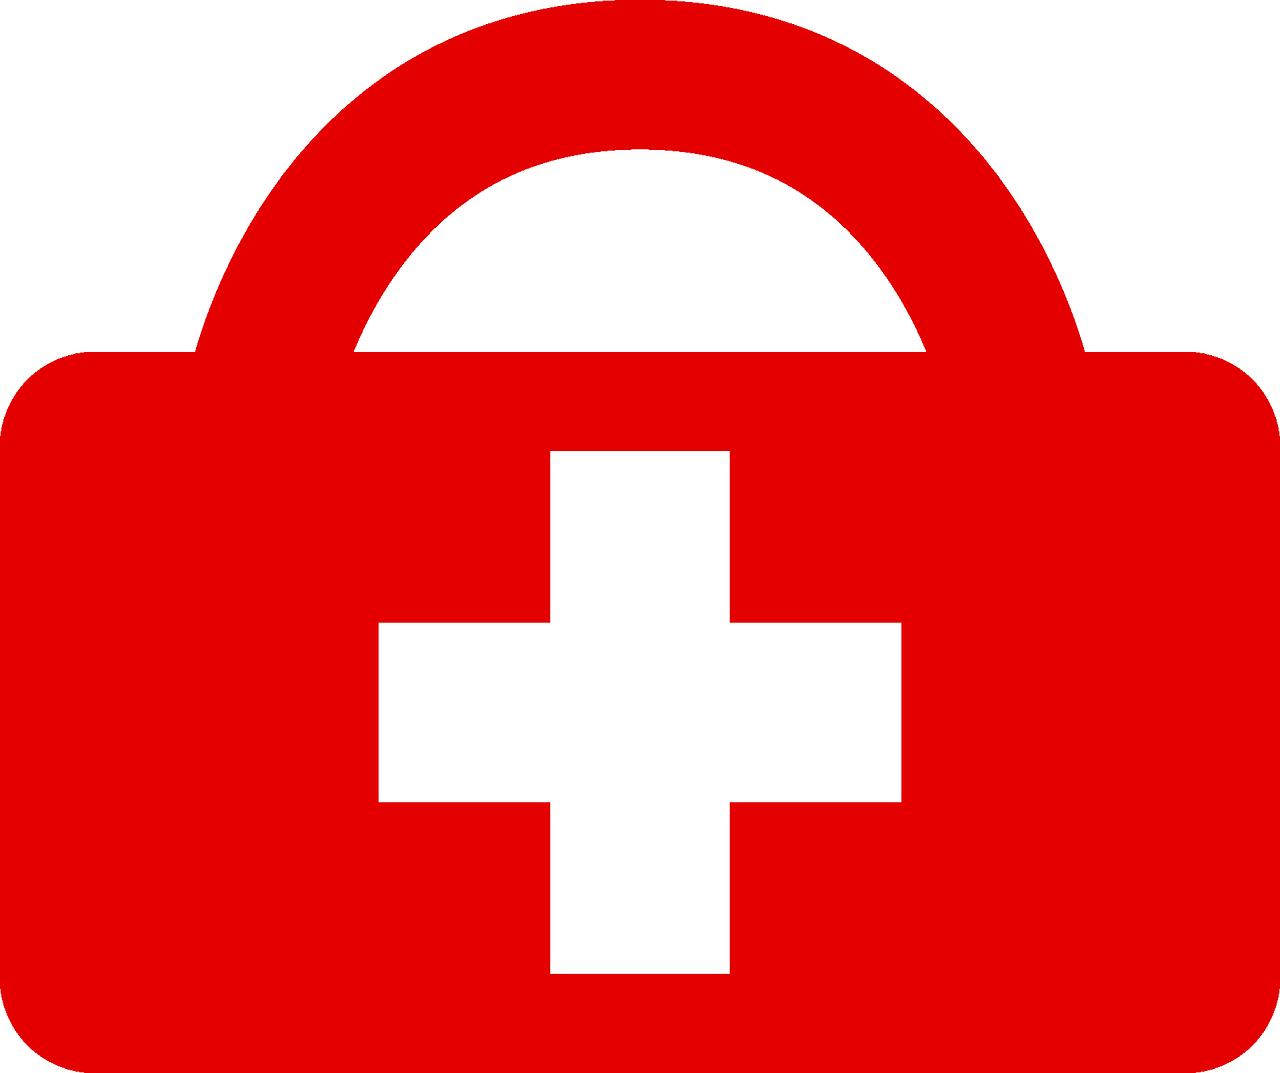 red-cross-158454_1280